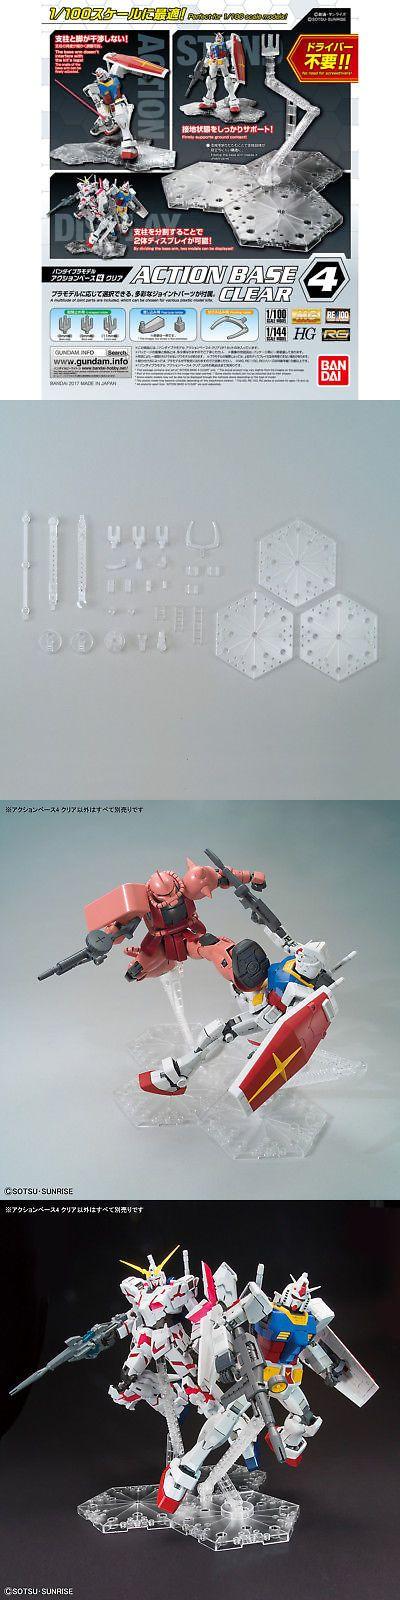 Bandai Gundam Action Base 5 Clear Gunpla 1//144 Scale Display Stand USA Seller